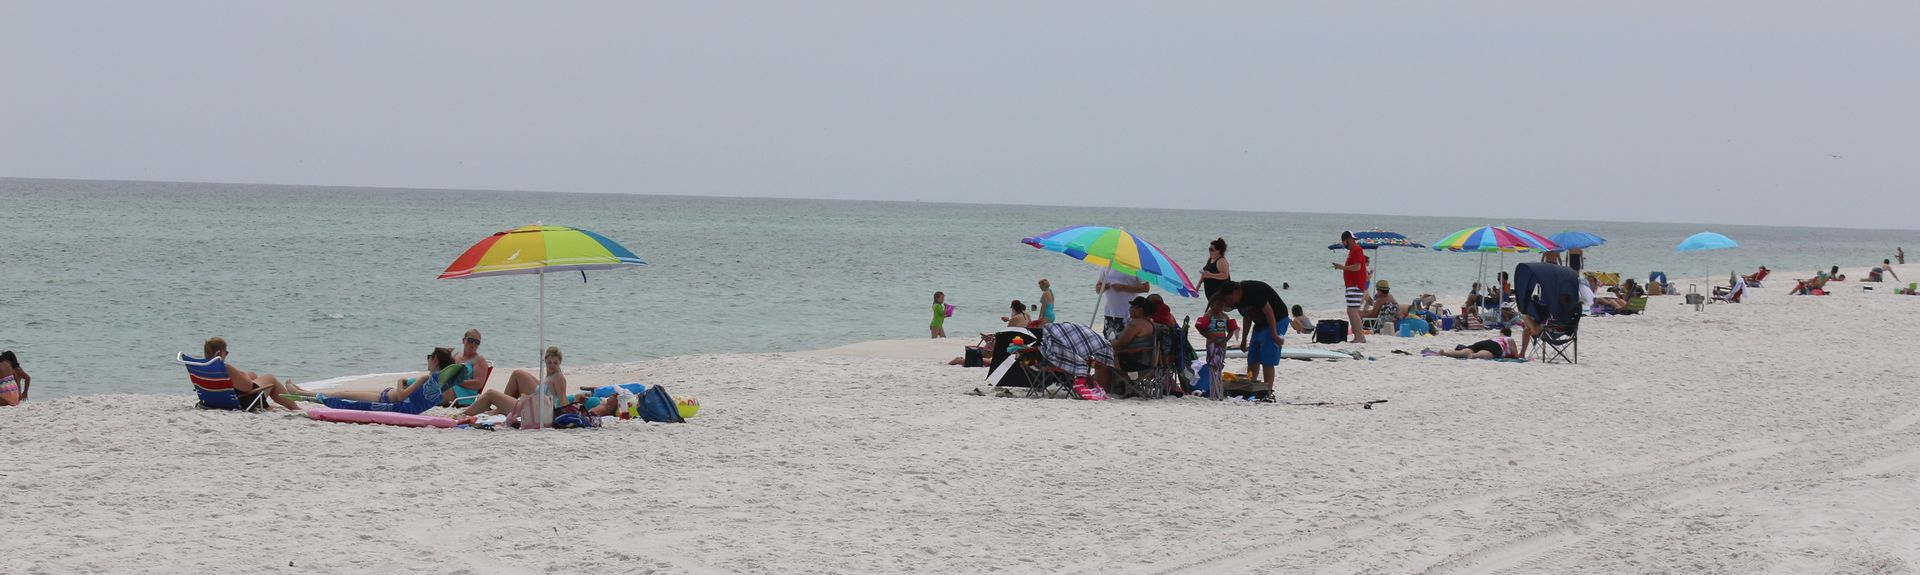 Navarre, Florida, Stati Uniti d'America